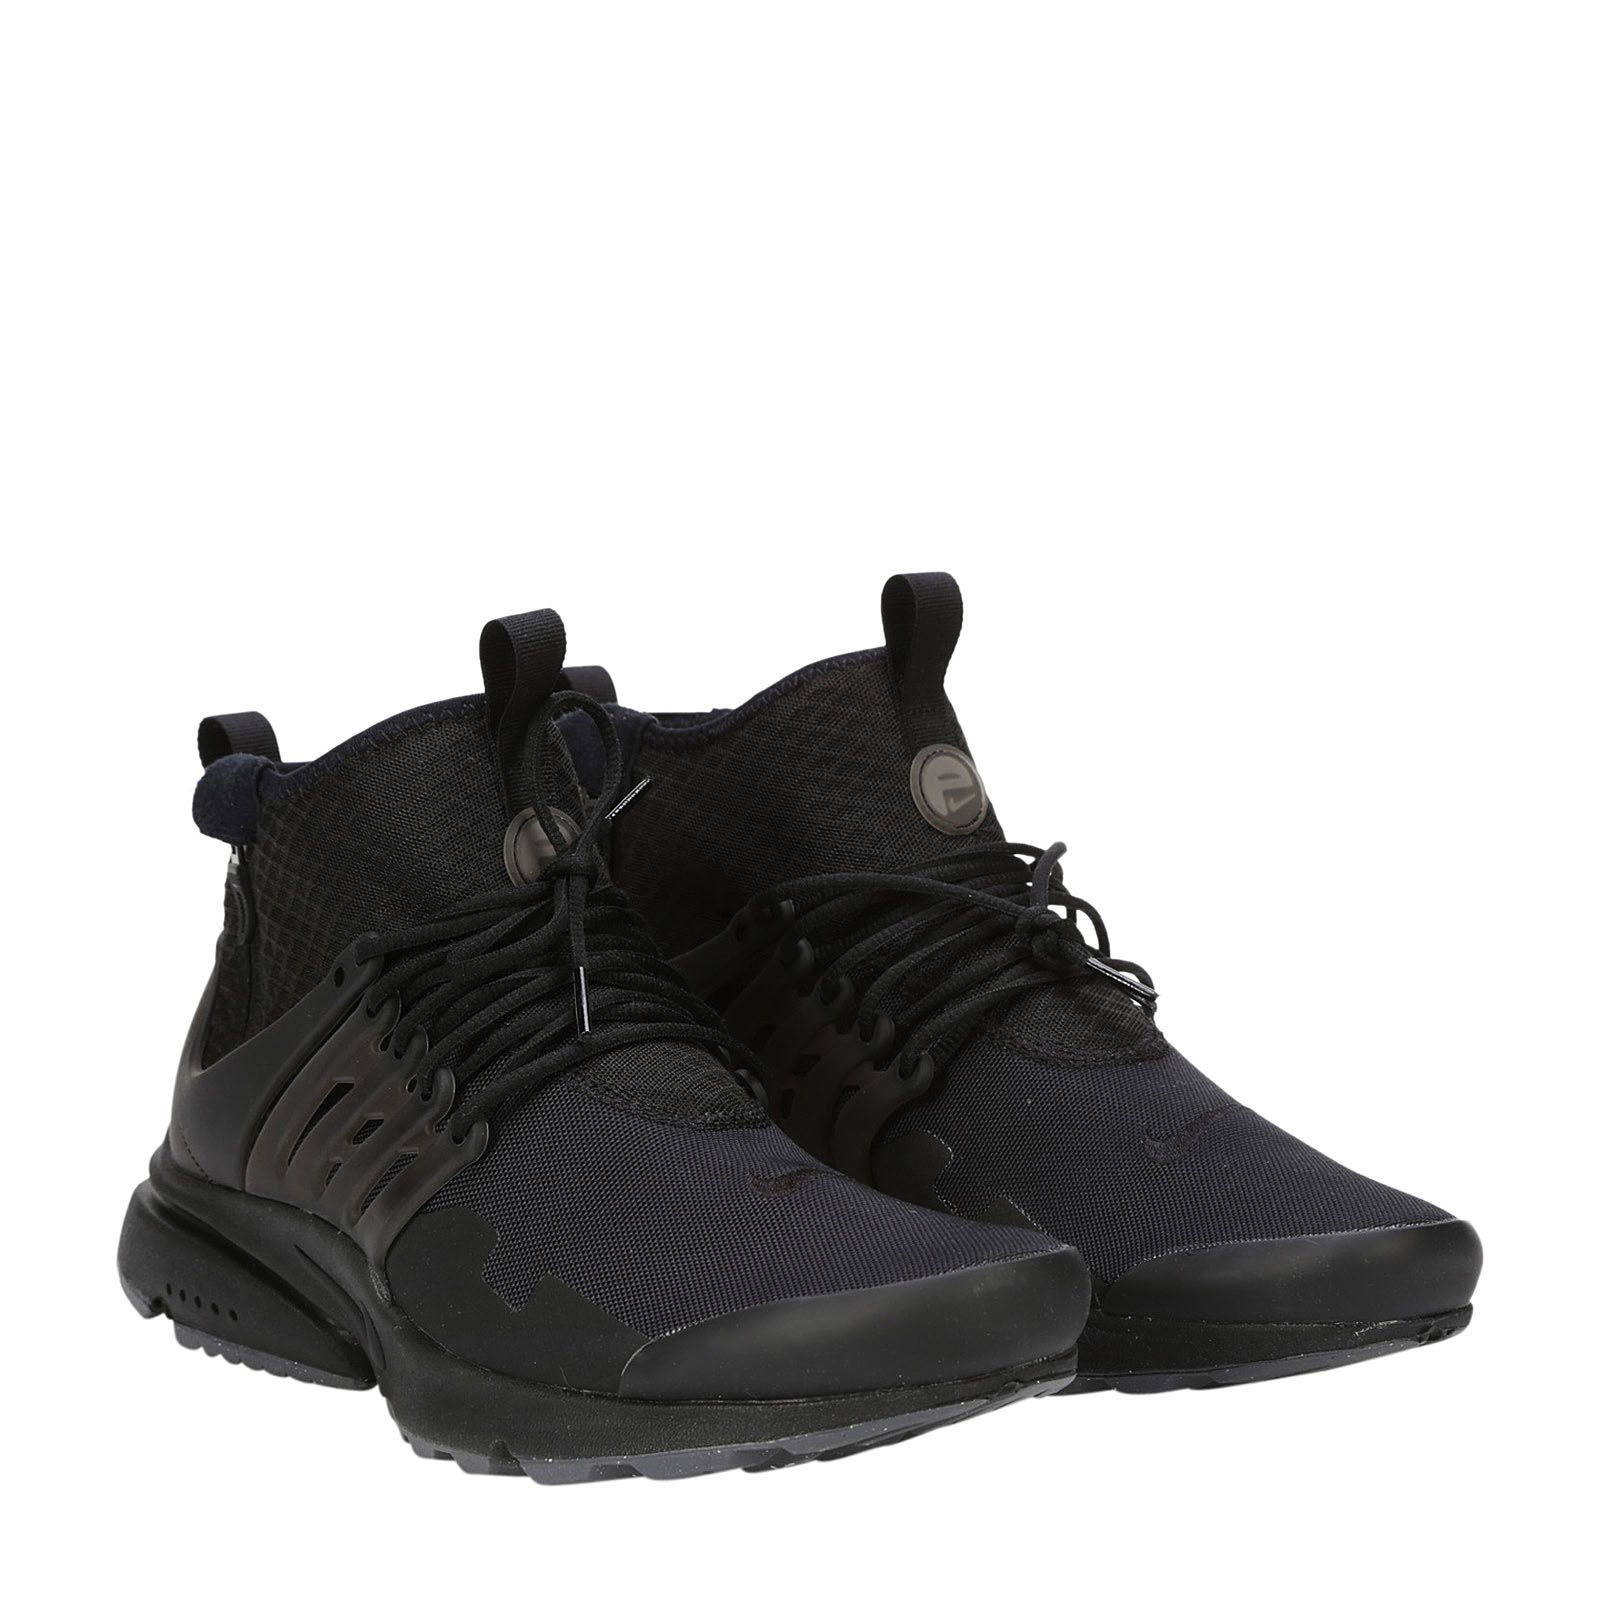 Nike Nike Air Presto Mid Utility Sneakers